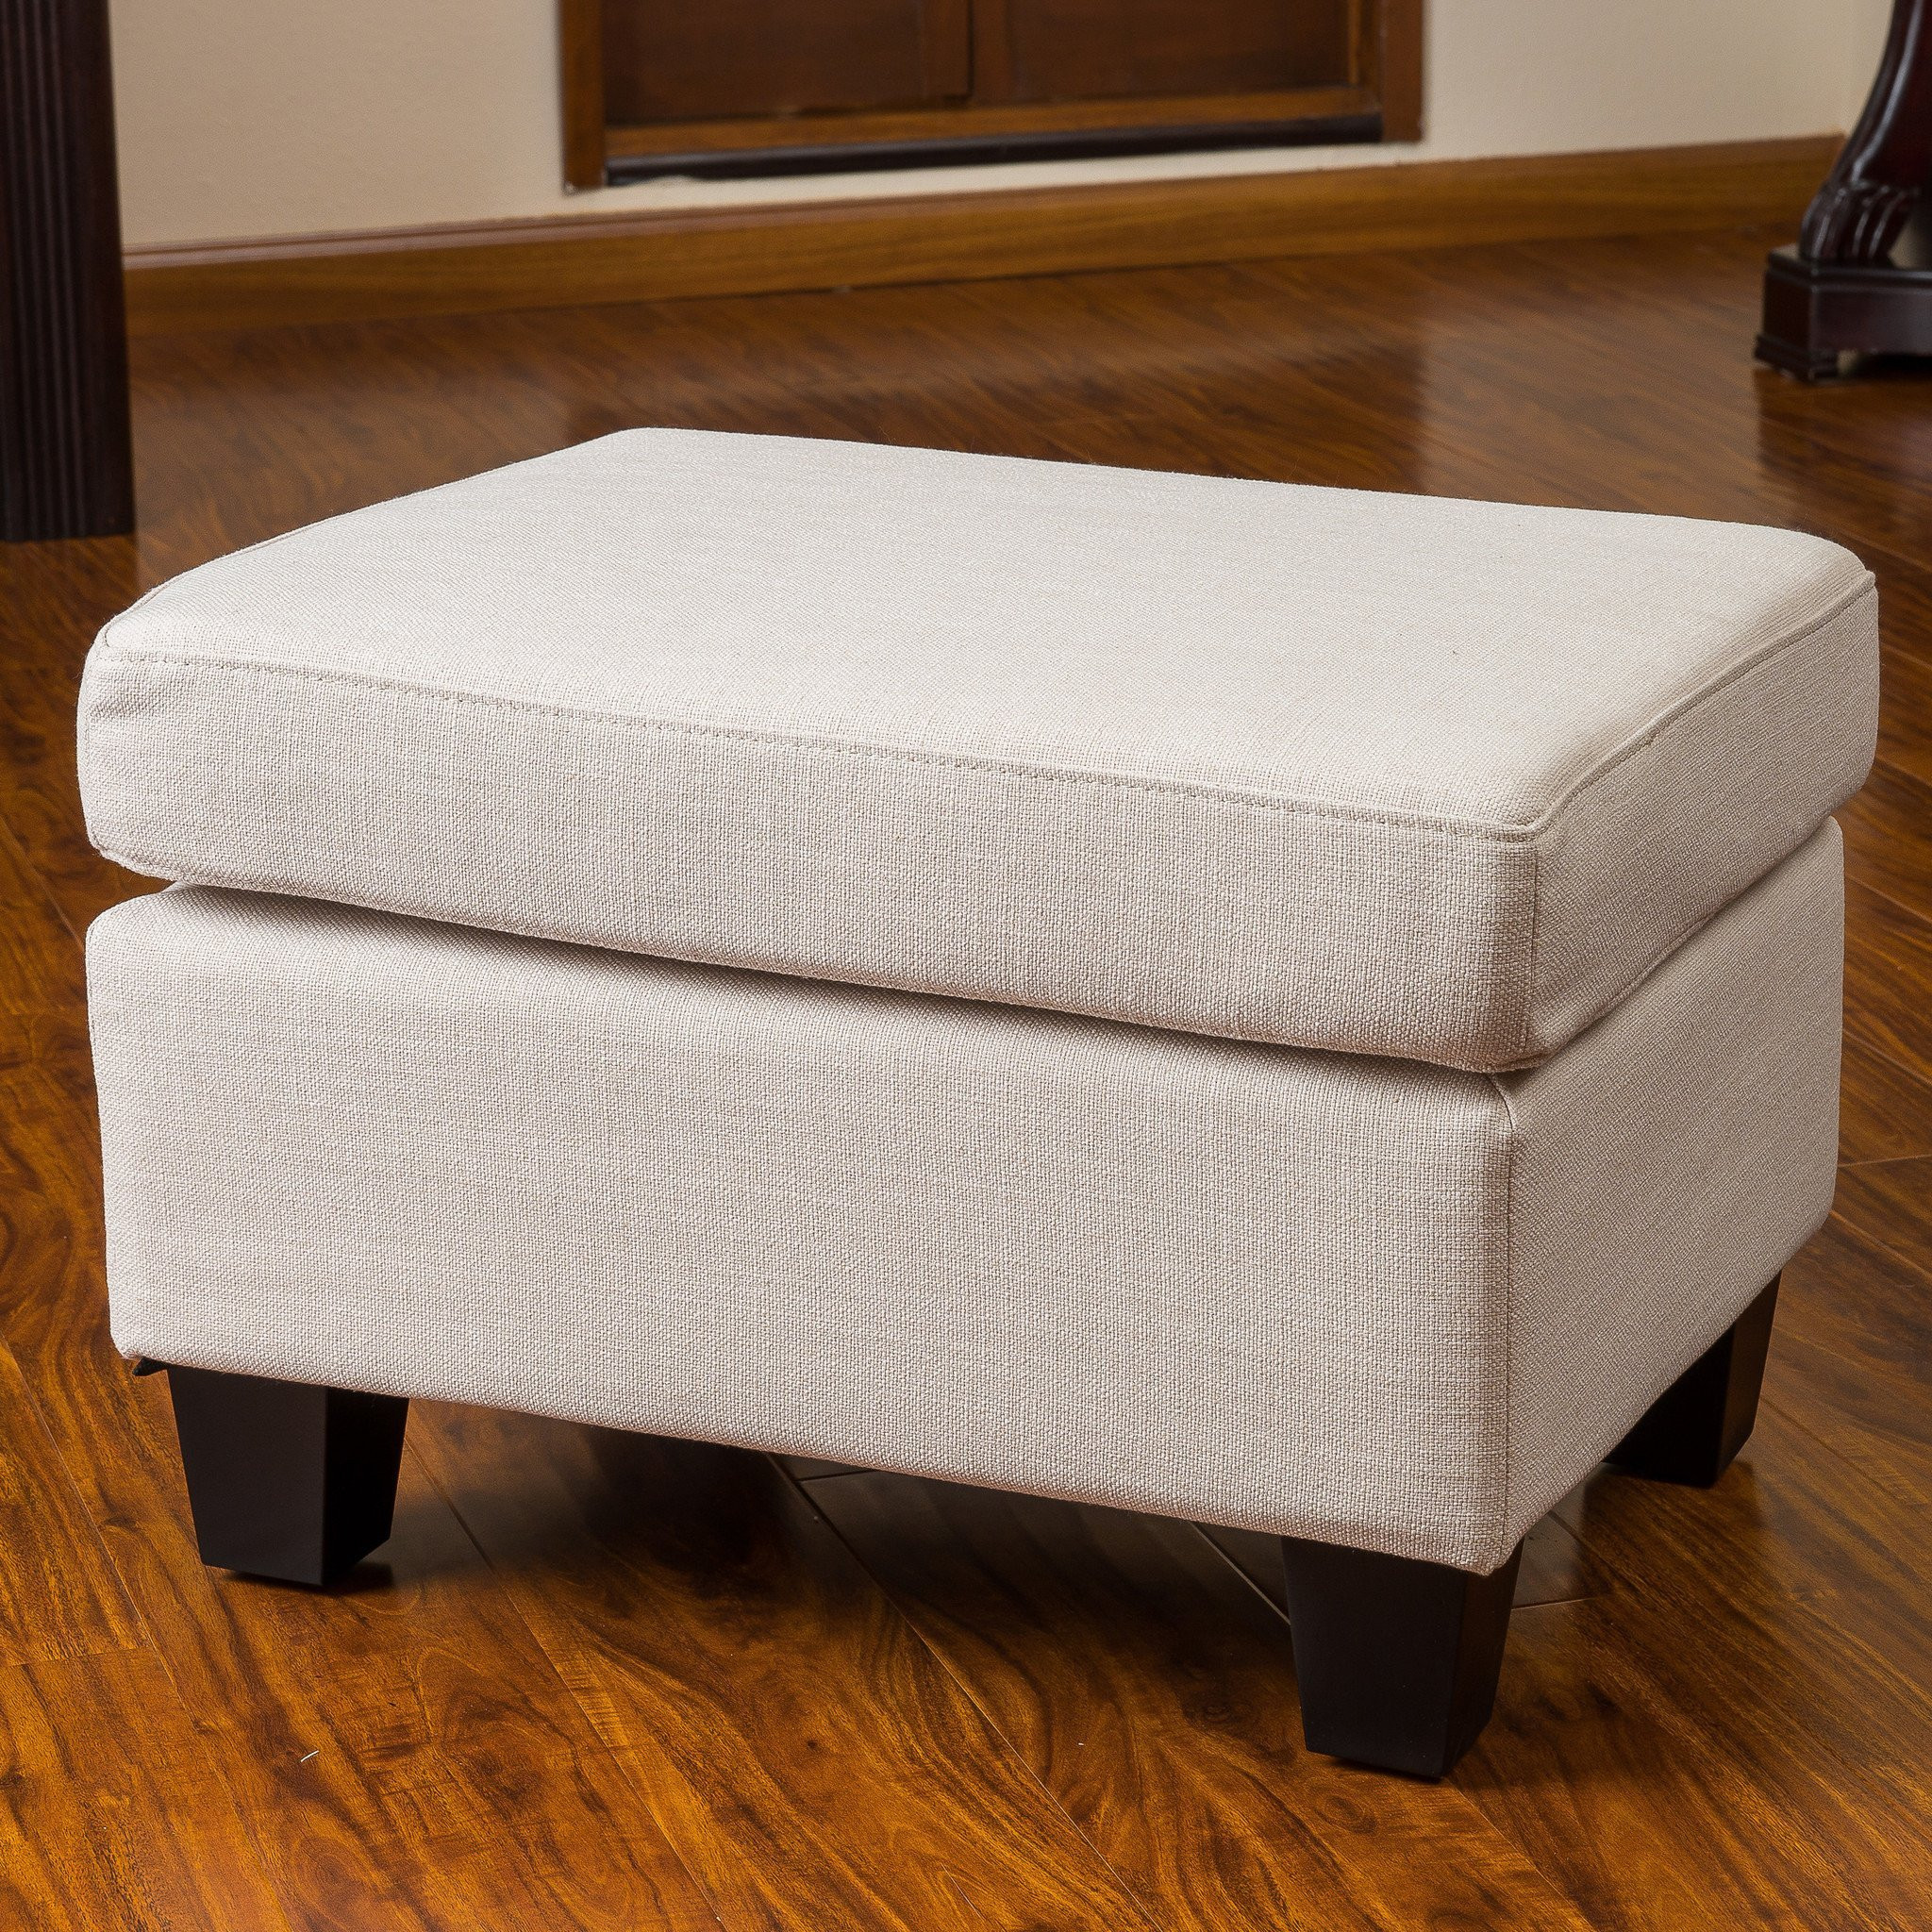 Christabel Beige Fabric Ottoman Footstool